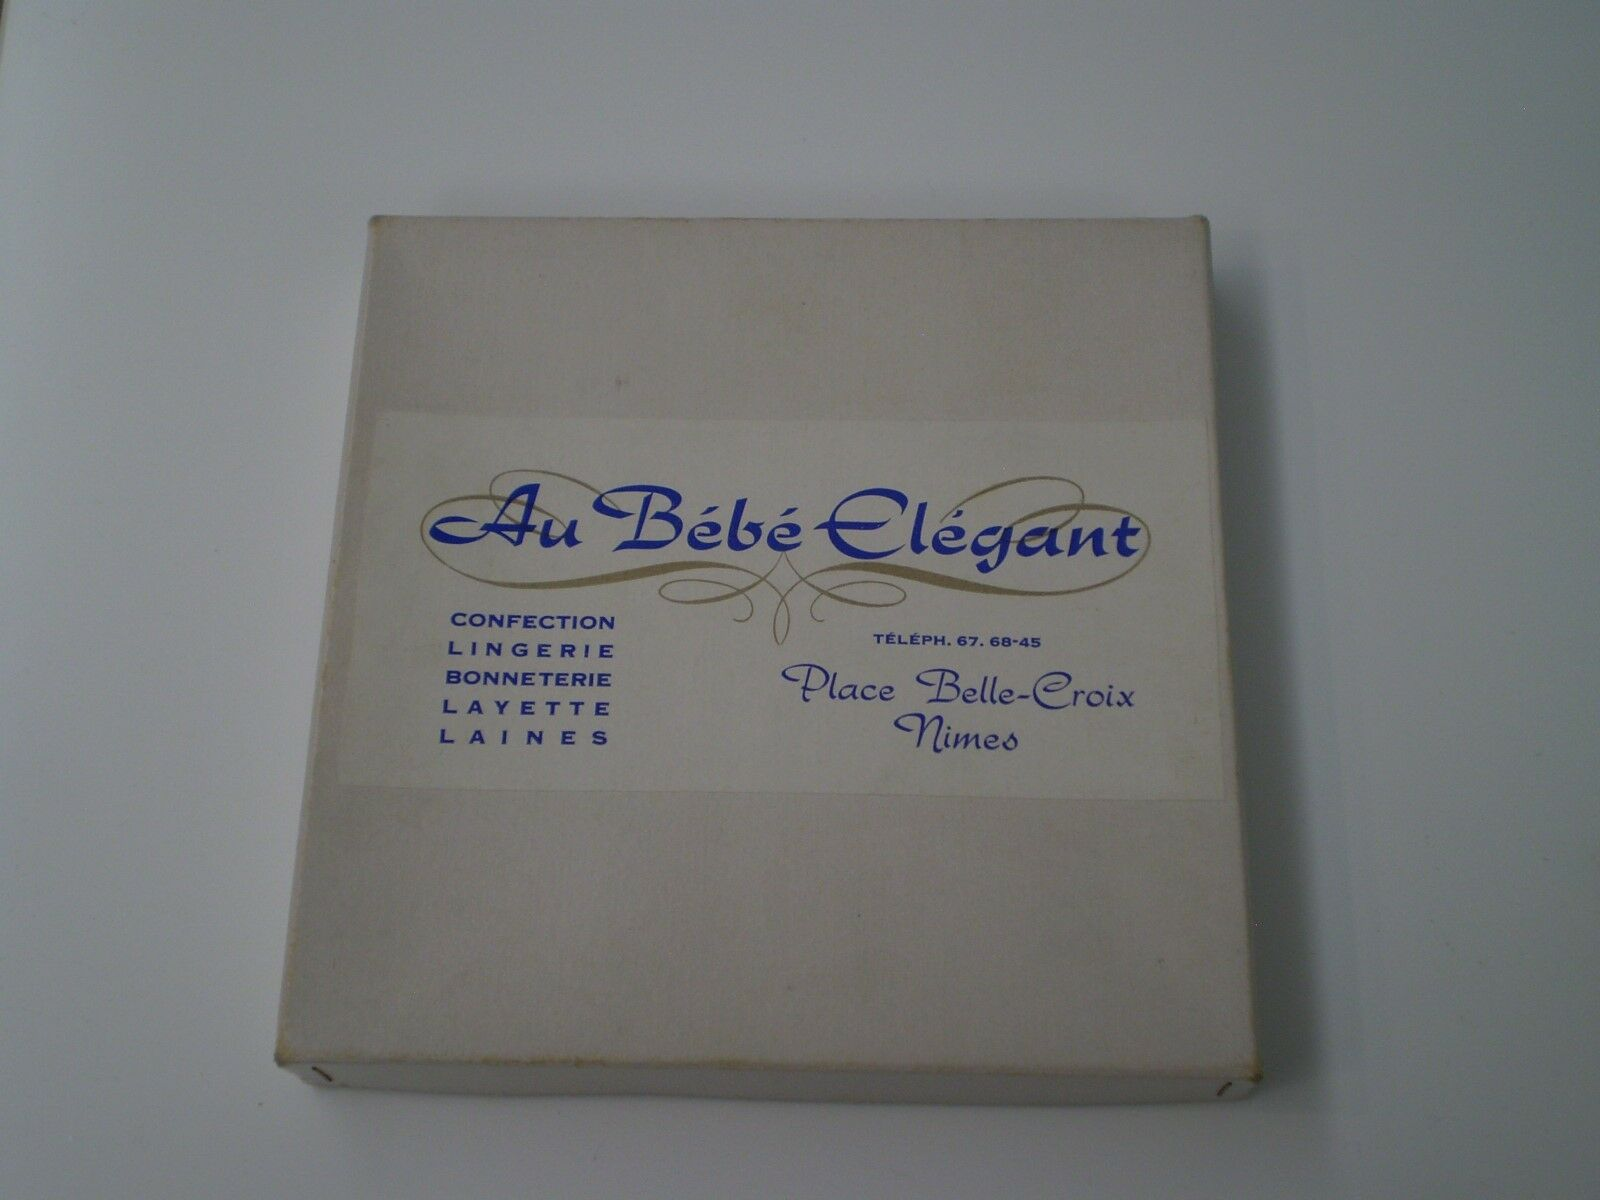 ANTIQUE CROWN DE FLEURS pr BABY OR LITTLE GIRL BOX ORIGINAL THE BABY ELEGANT